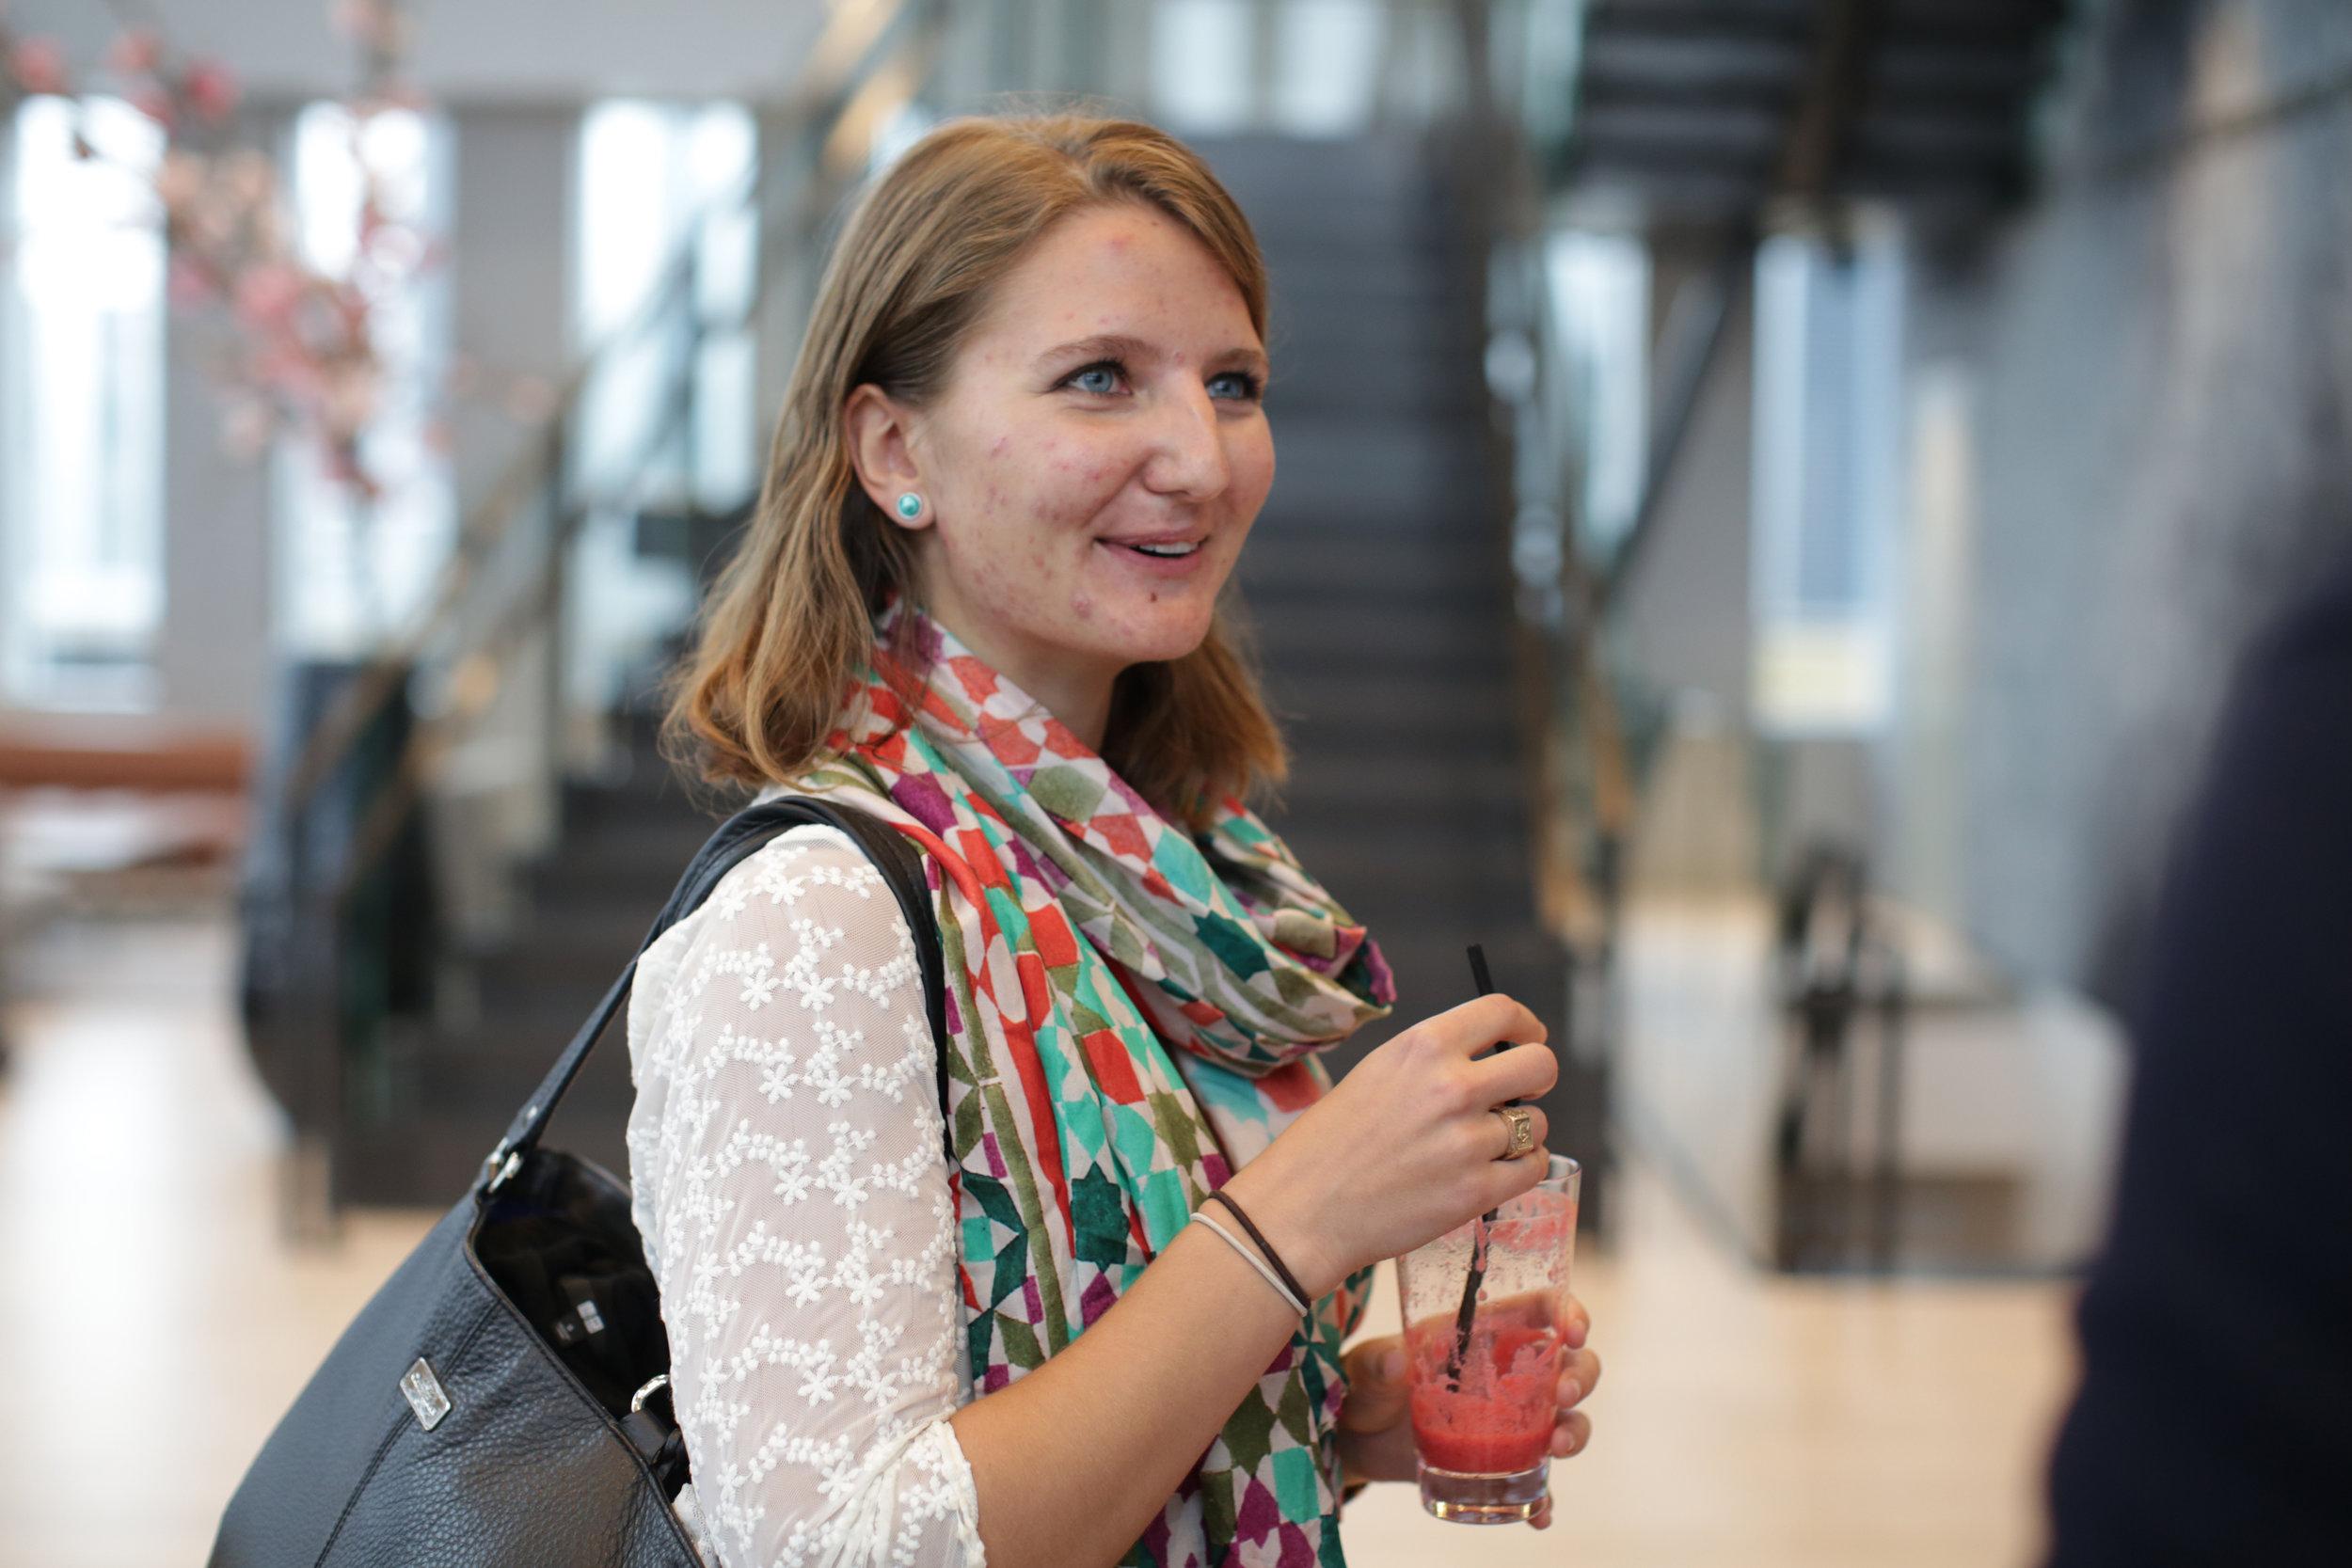 Katrine Tjølsen - M.Eng. Computer Science